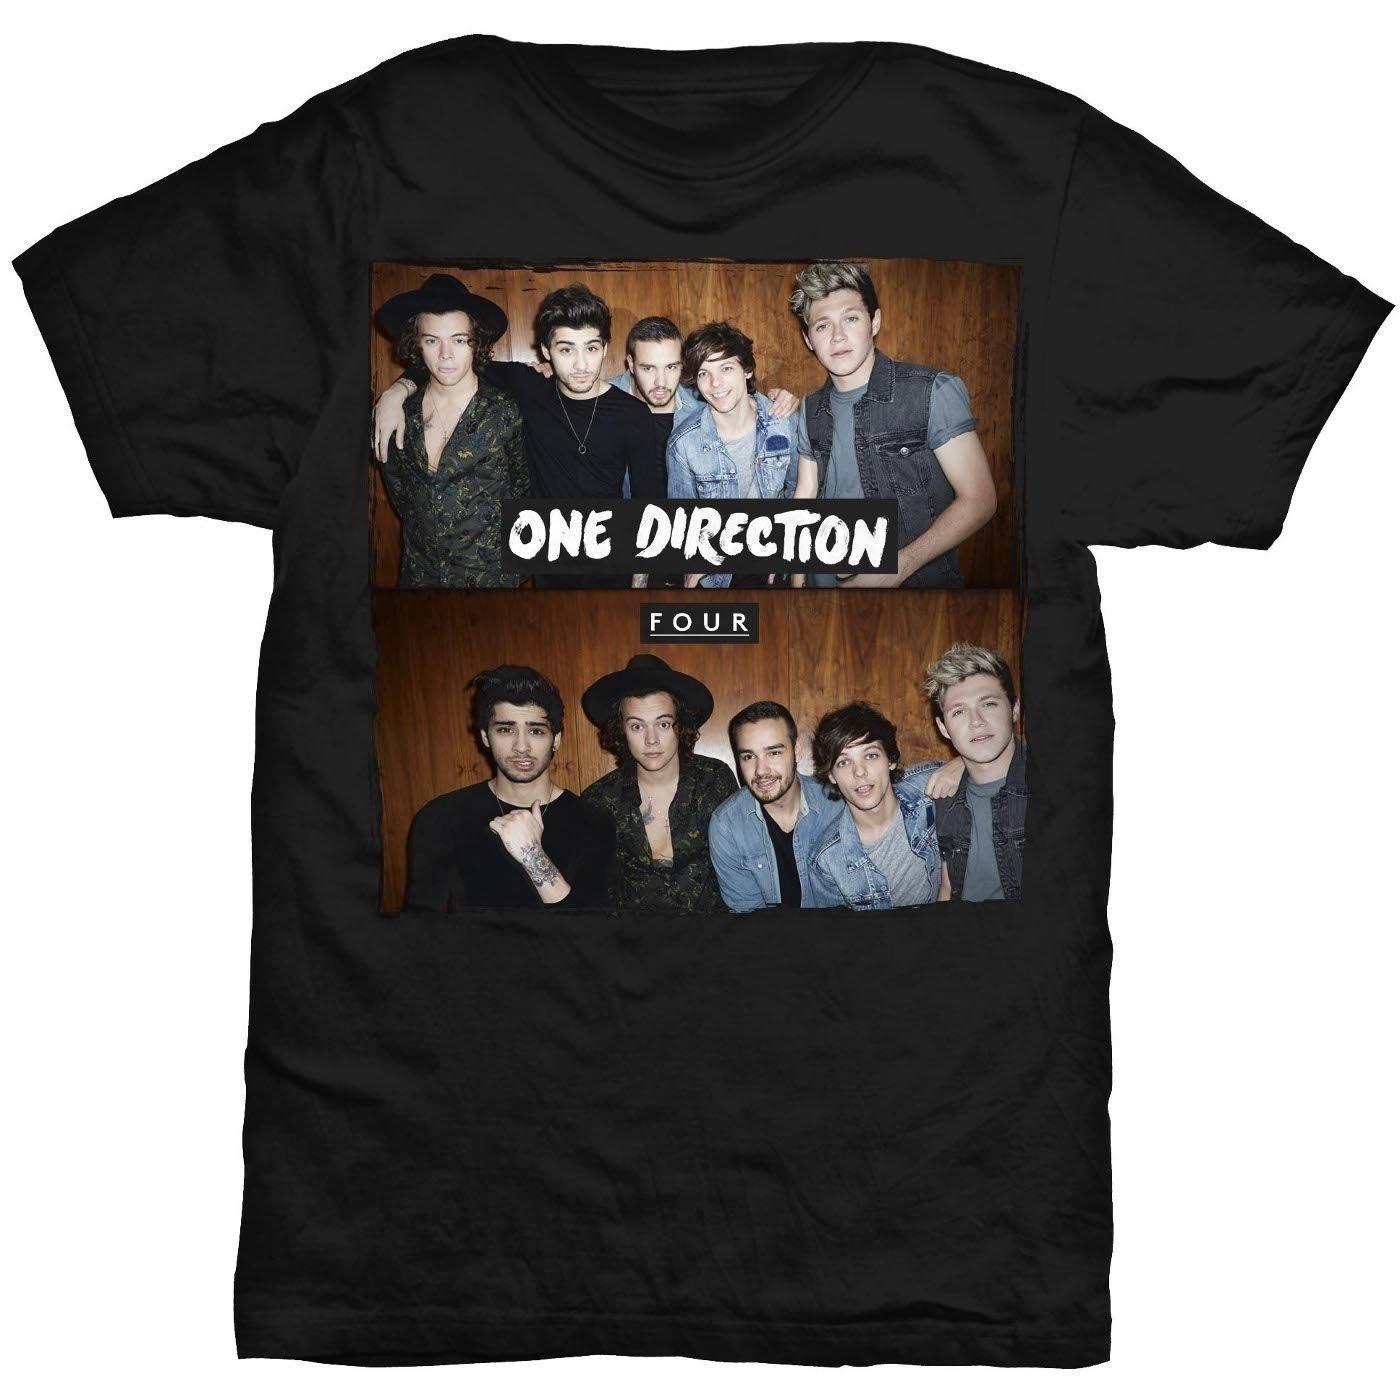 10 Elegant One Direction Shirt Ideas For Concert one direction one direction four black t shirt medium jen 2020